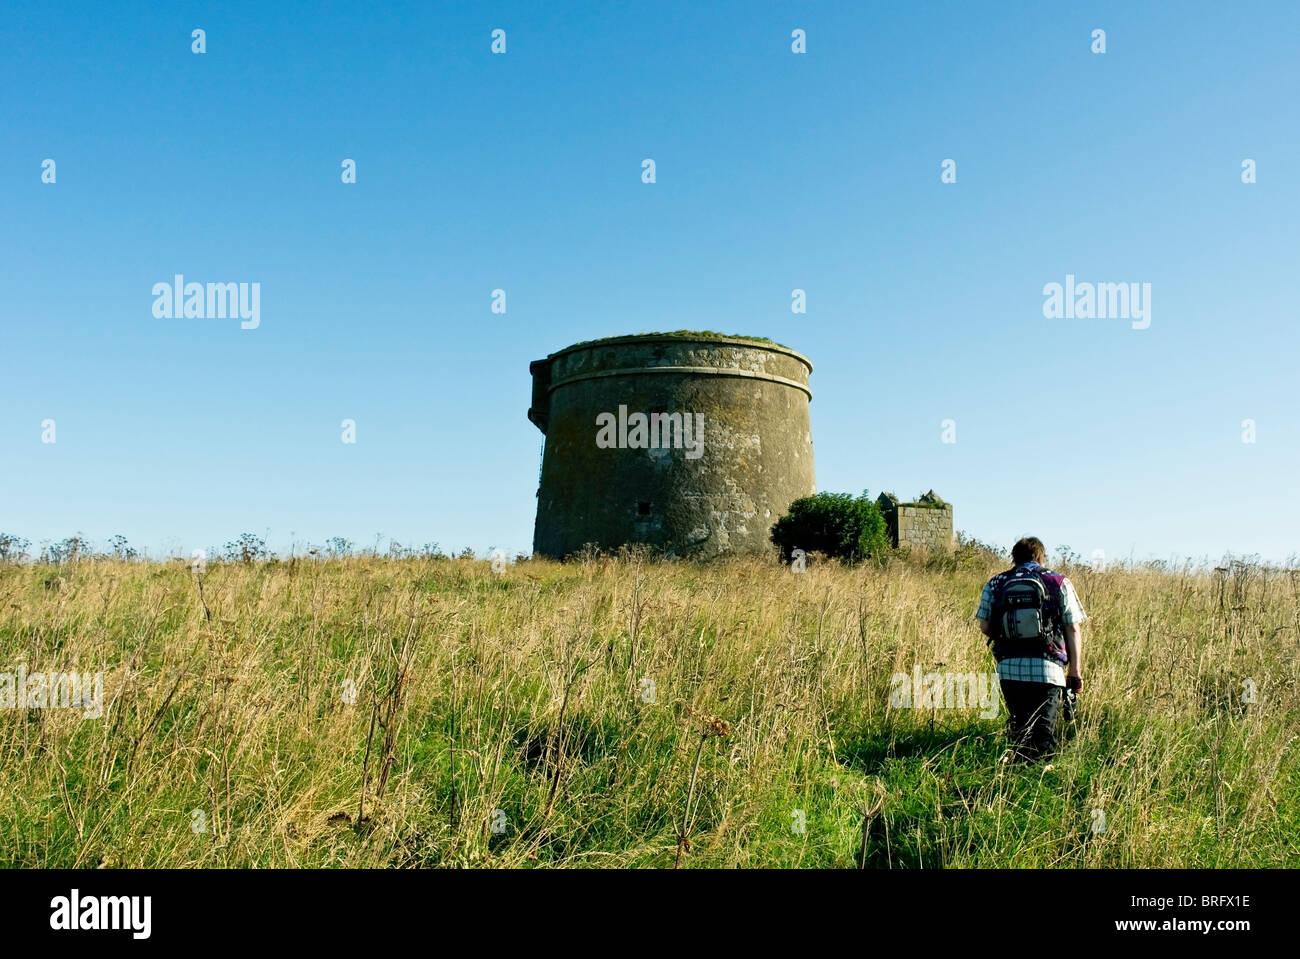 The Napoleonic era defensive Martello Tower built on Shenick Island, Skerries, Co.Dublin, Ireland - Stock Image